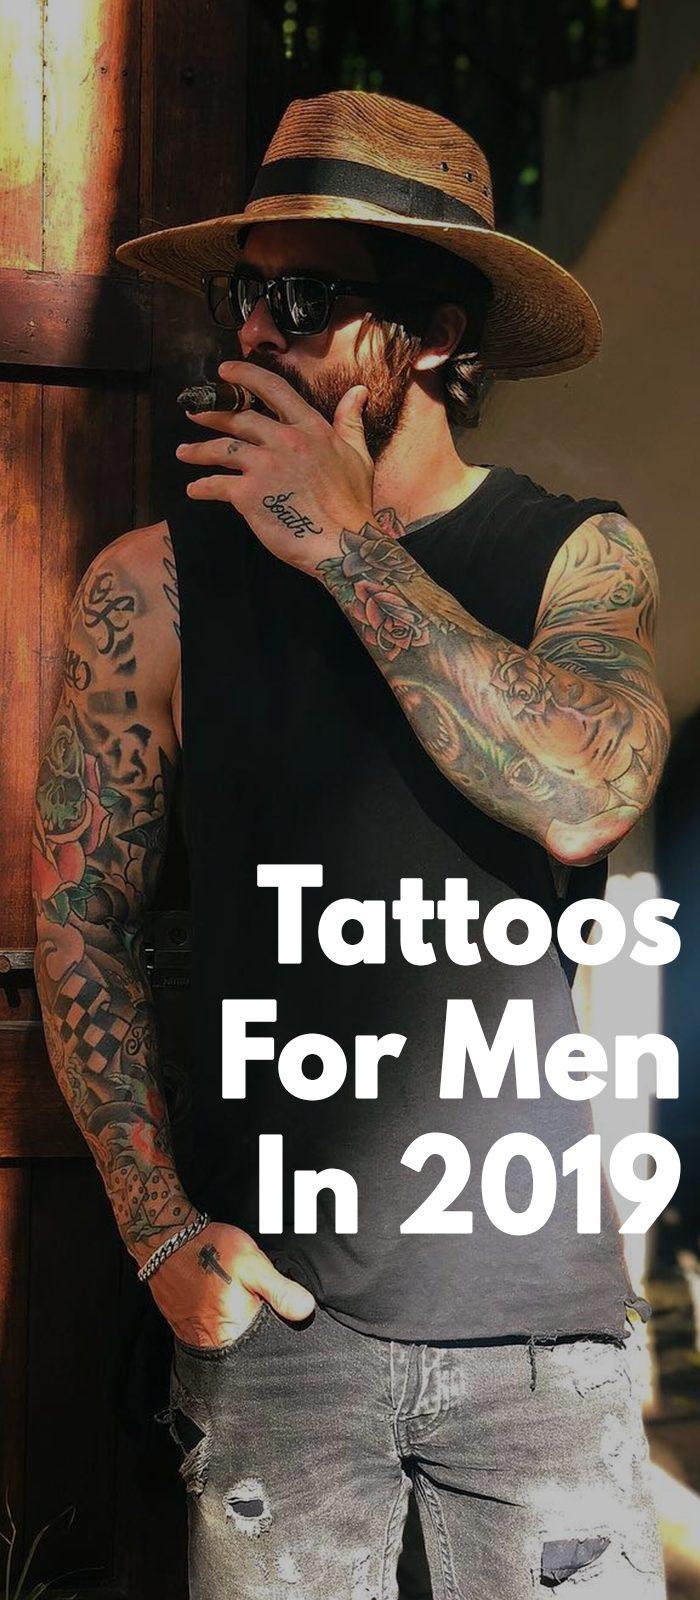 Best Tattoos For Men In 2019